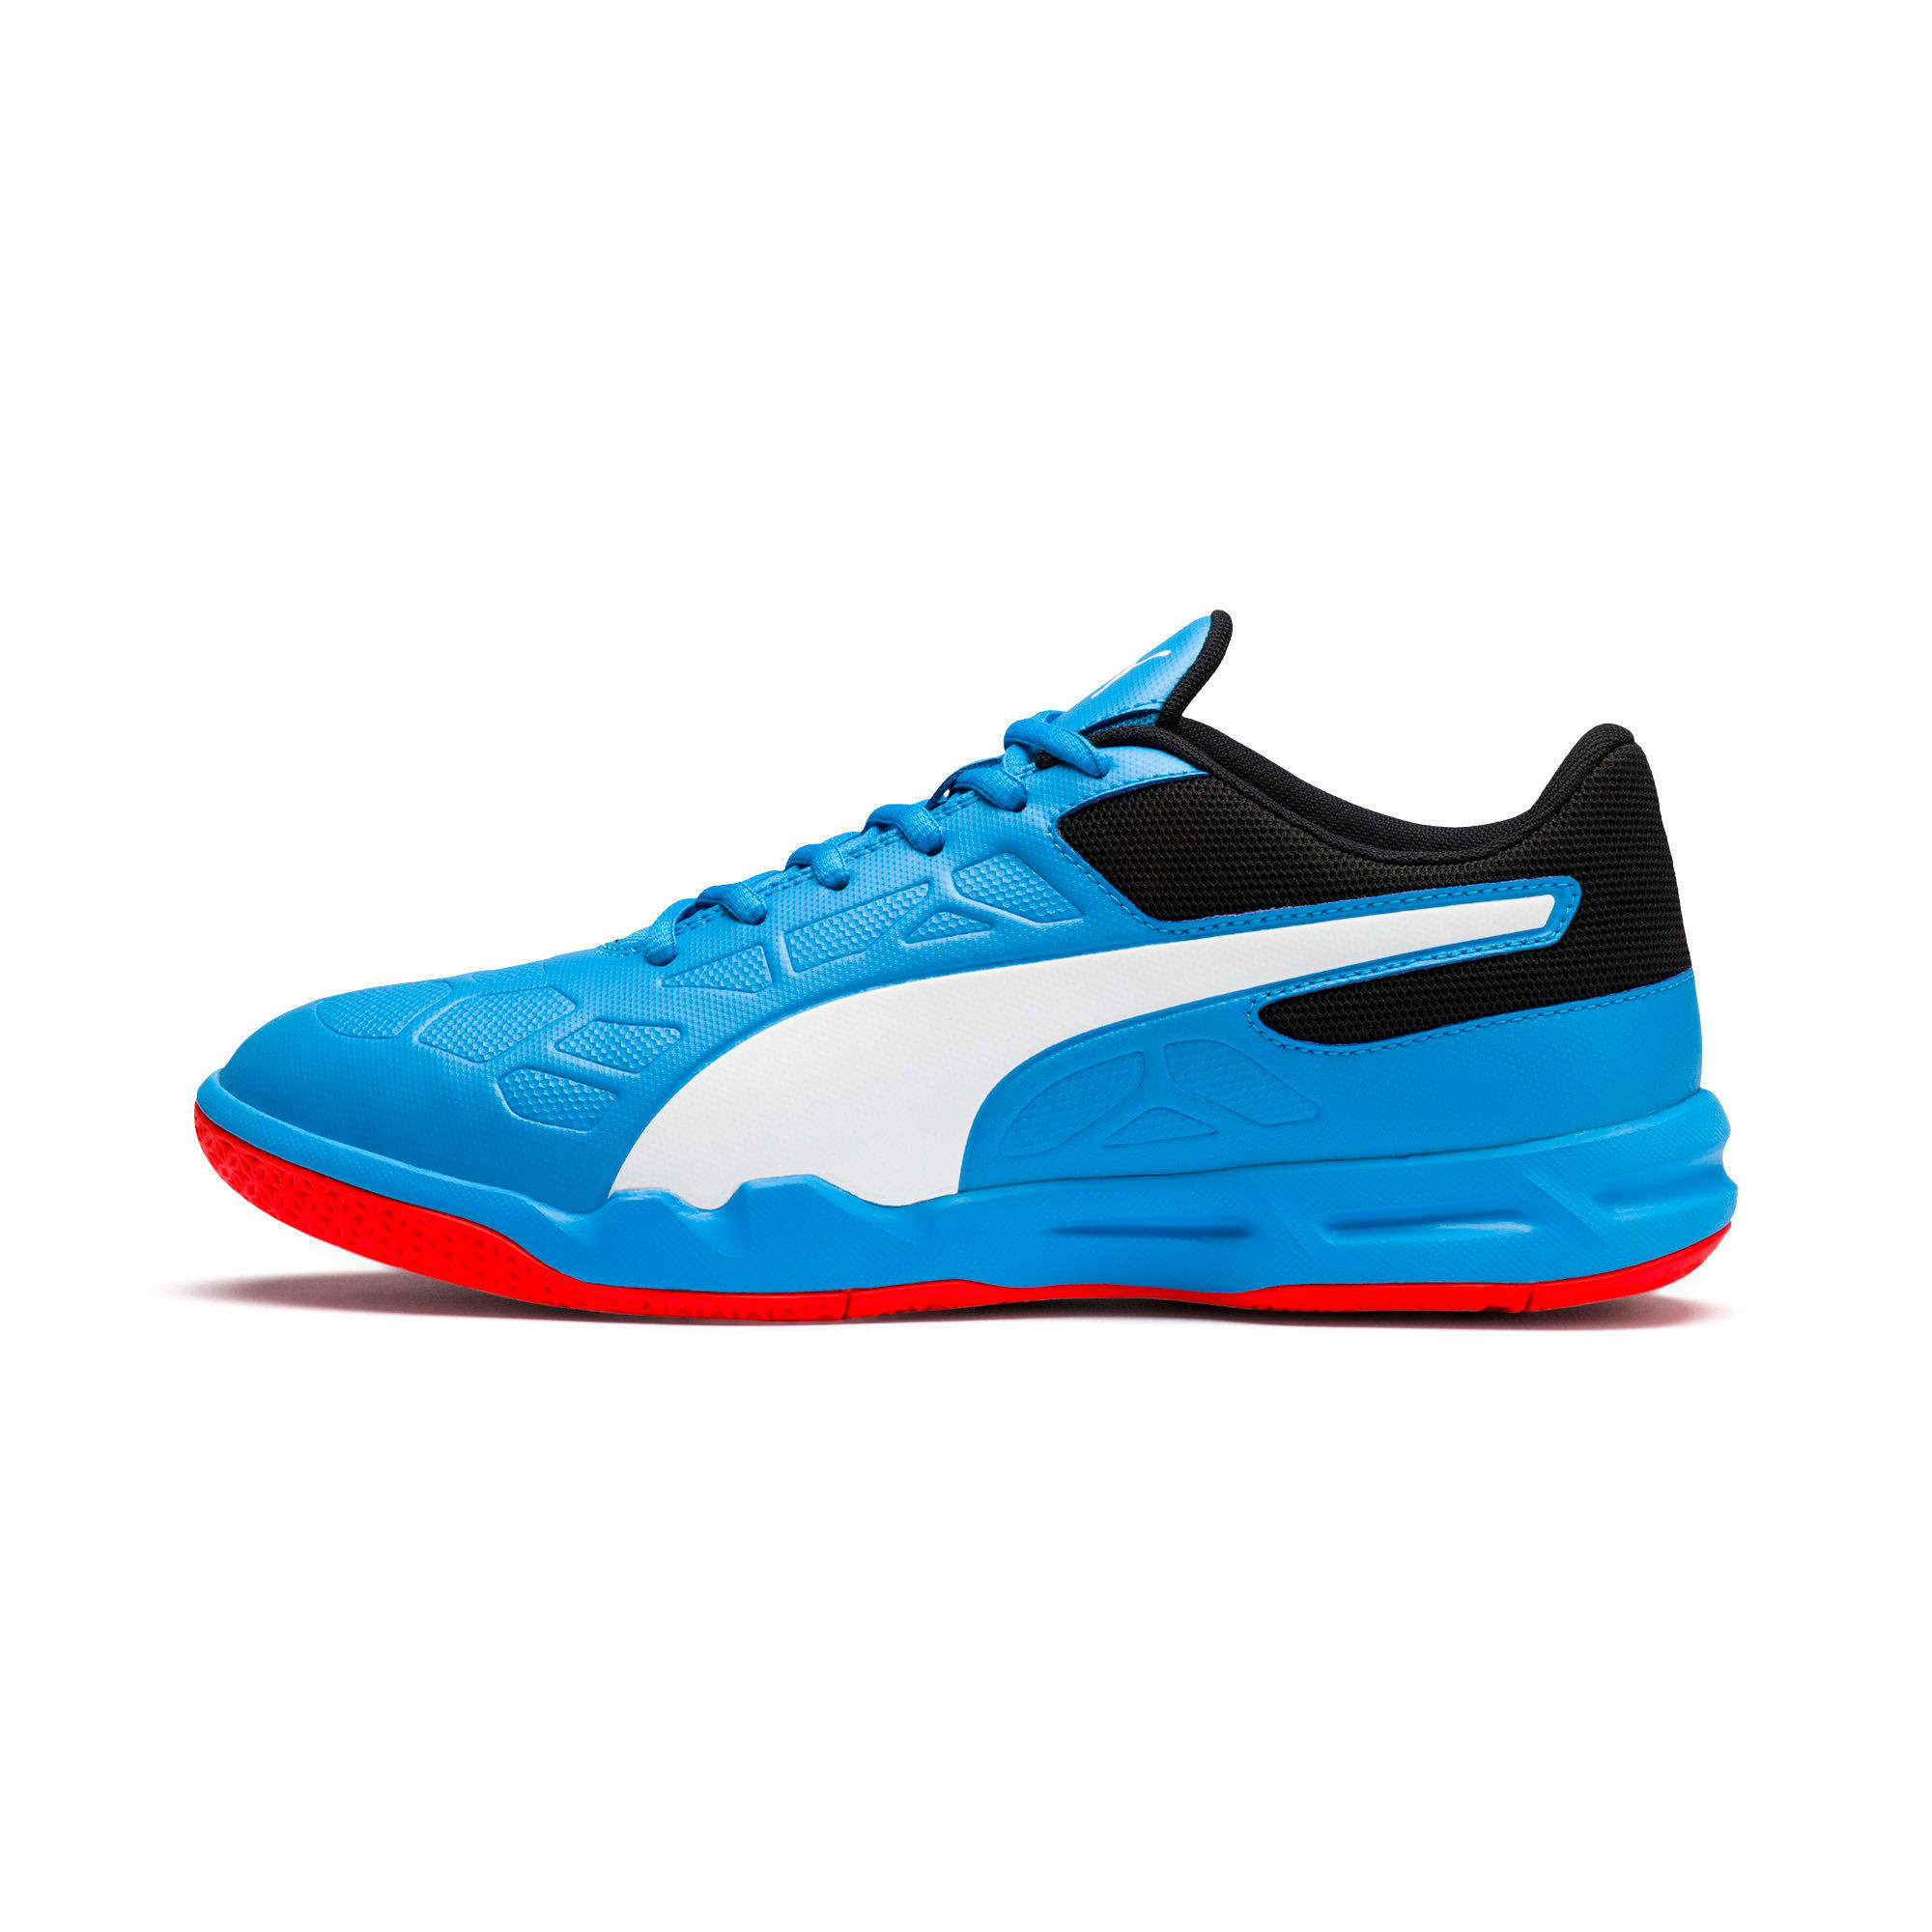 Thumbnail 1 of Tenaz Indoor Teamsport Shoes, Bleu Azur-White-Black-Red, medium-IND